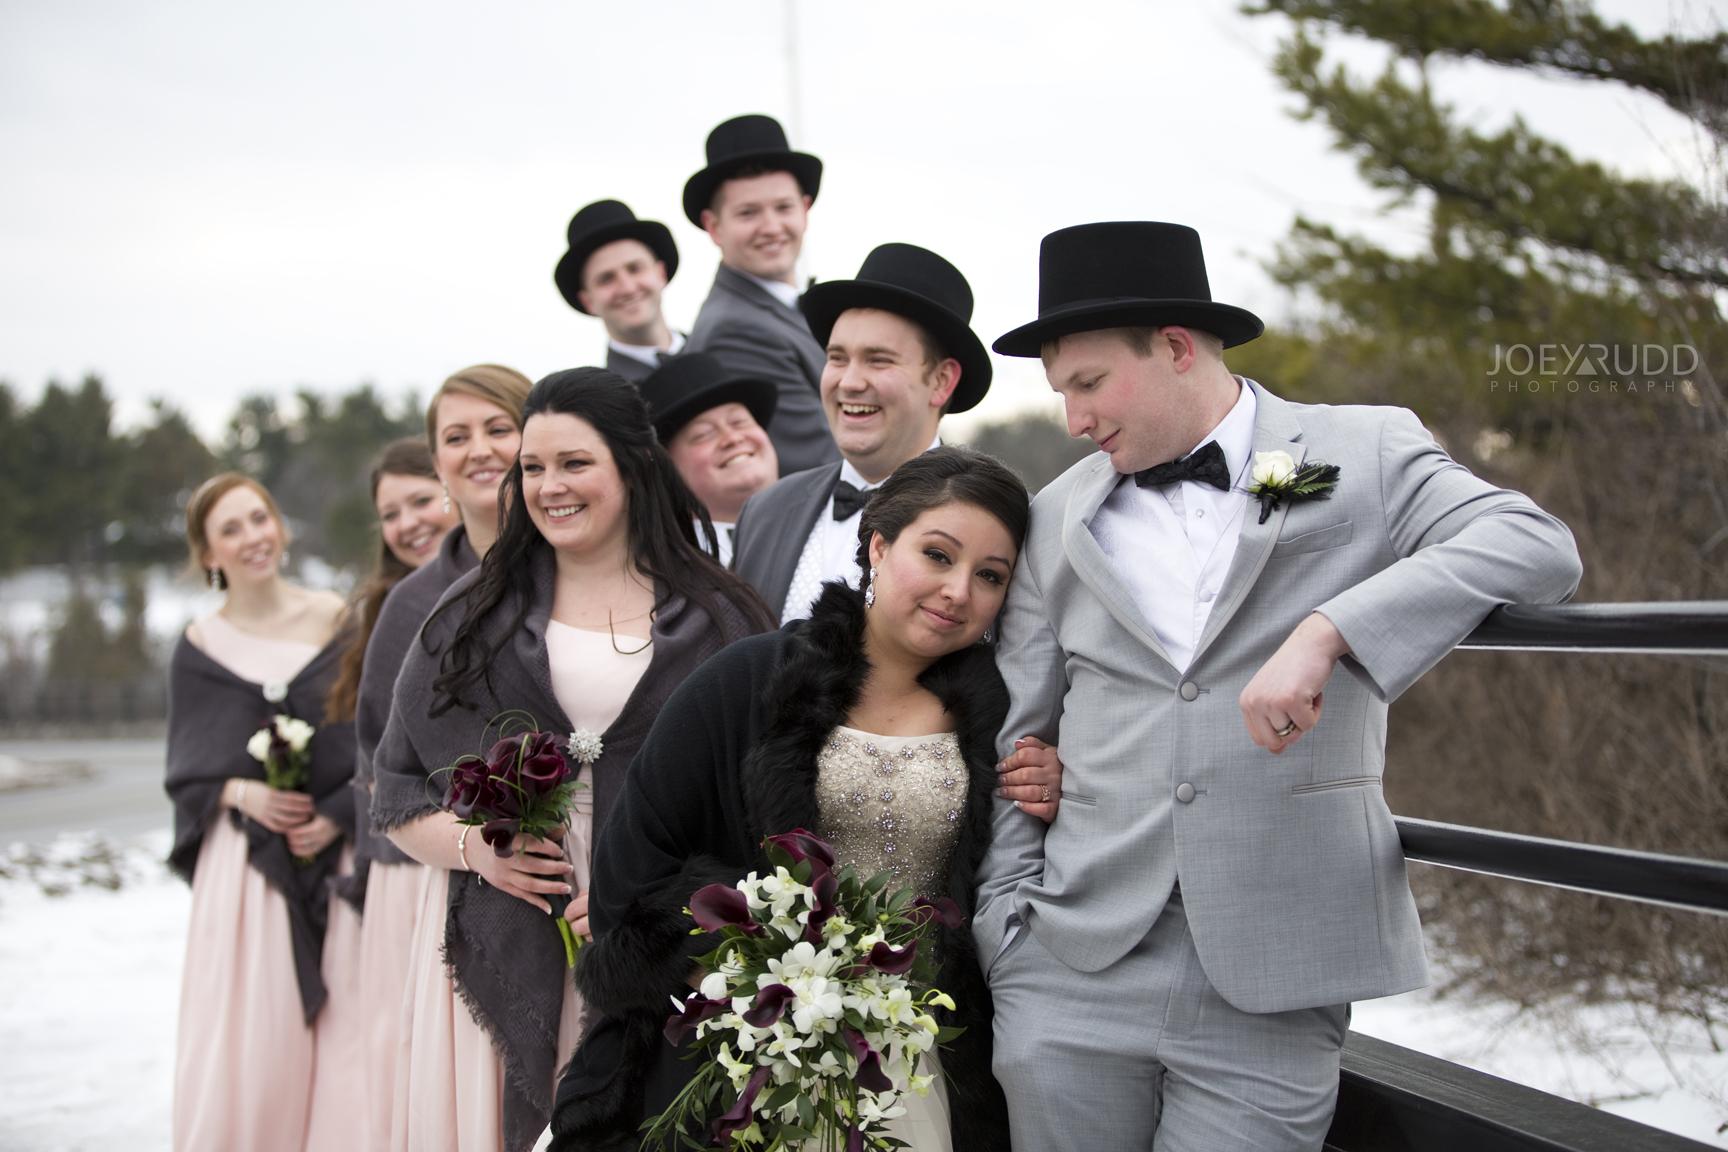 Fun Wedding Party Photos Ottawa Joey Rudd Photography